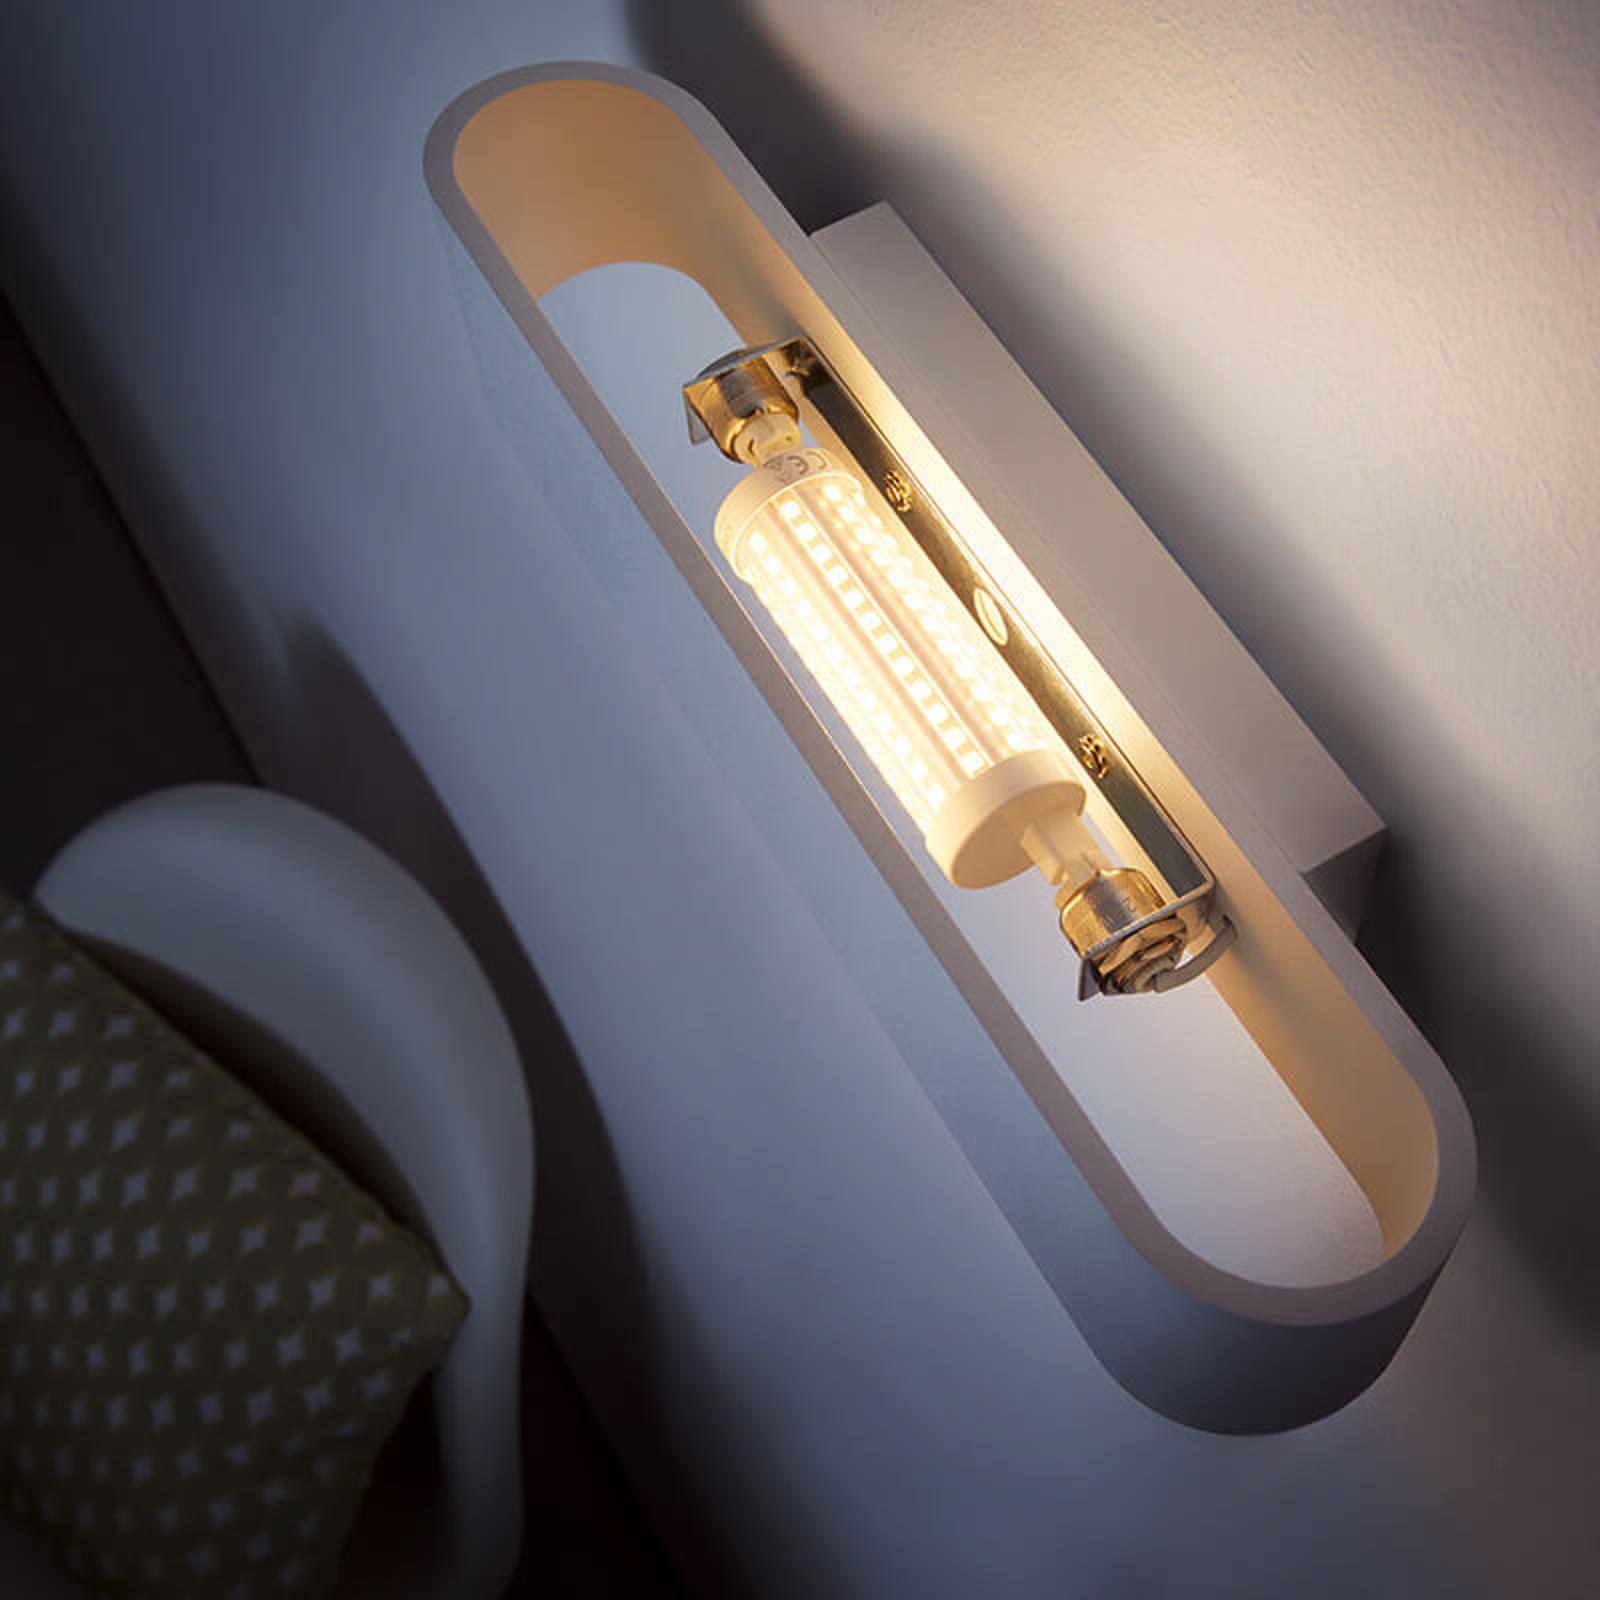 LED-Stablampe R7s 15W, warmweiß, 2.000 Lumen